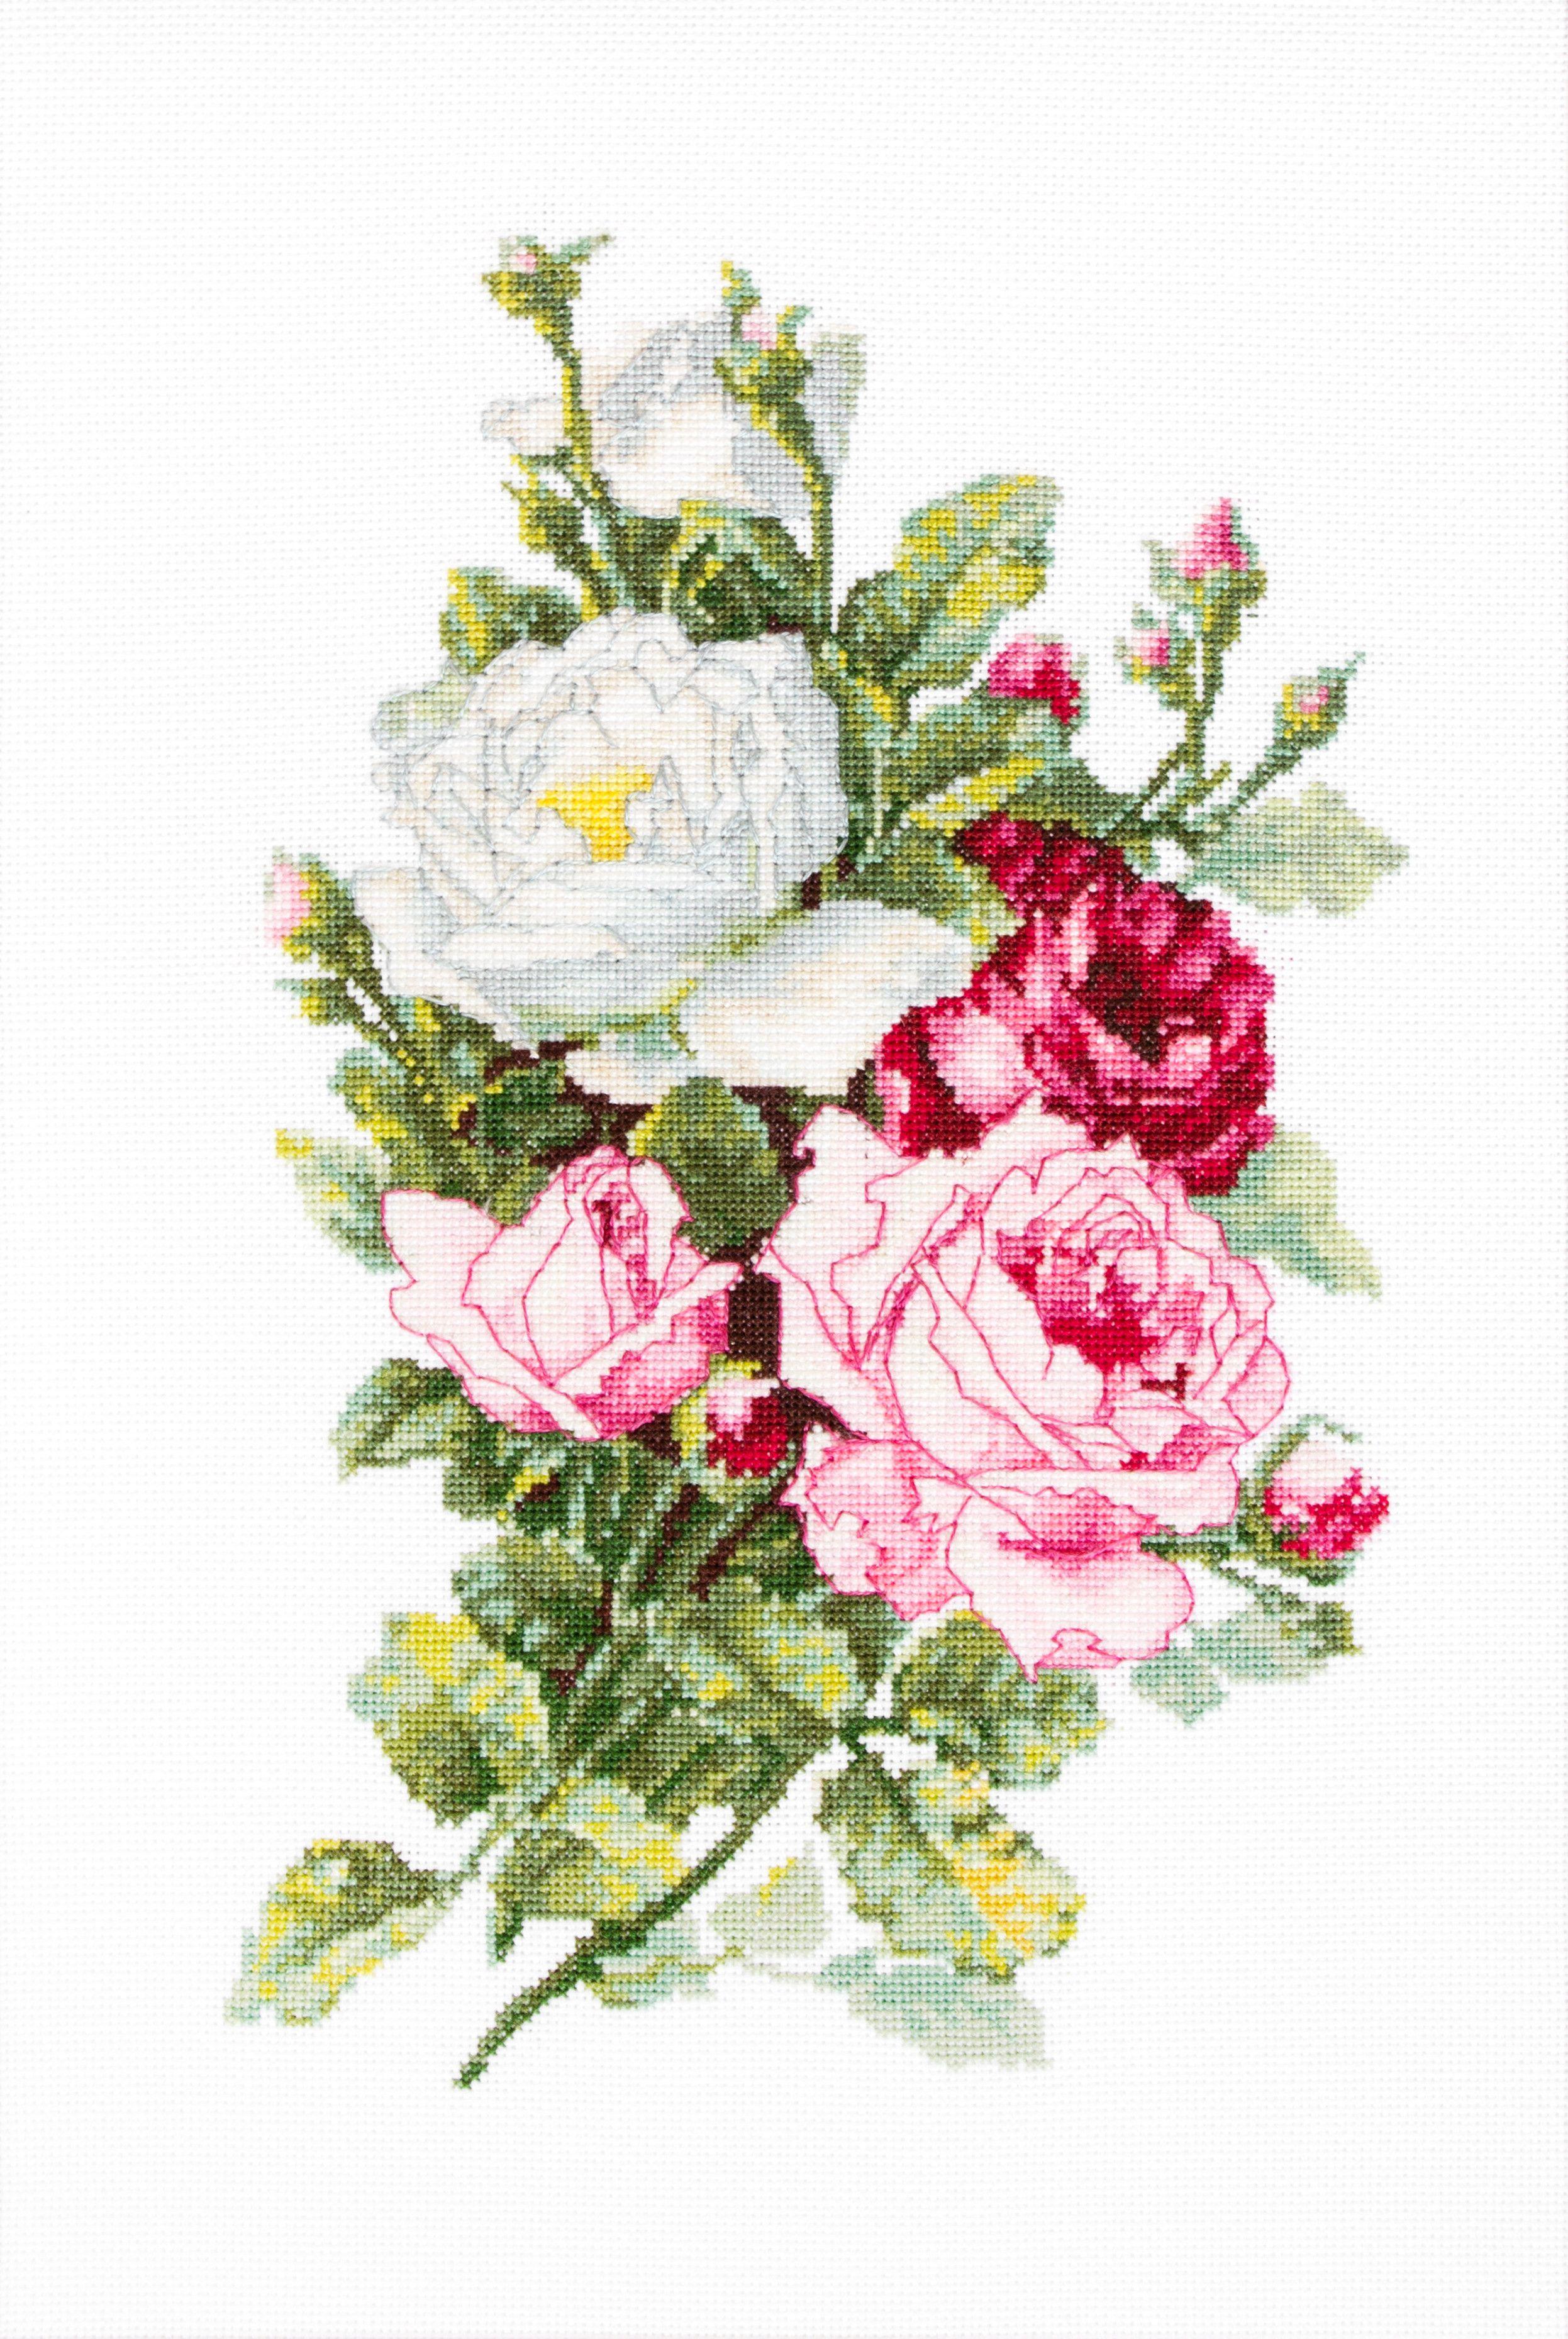 Cross-stitch bouquets of flowers scheme flower arrangements